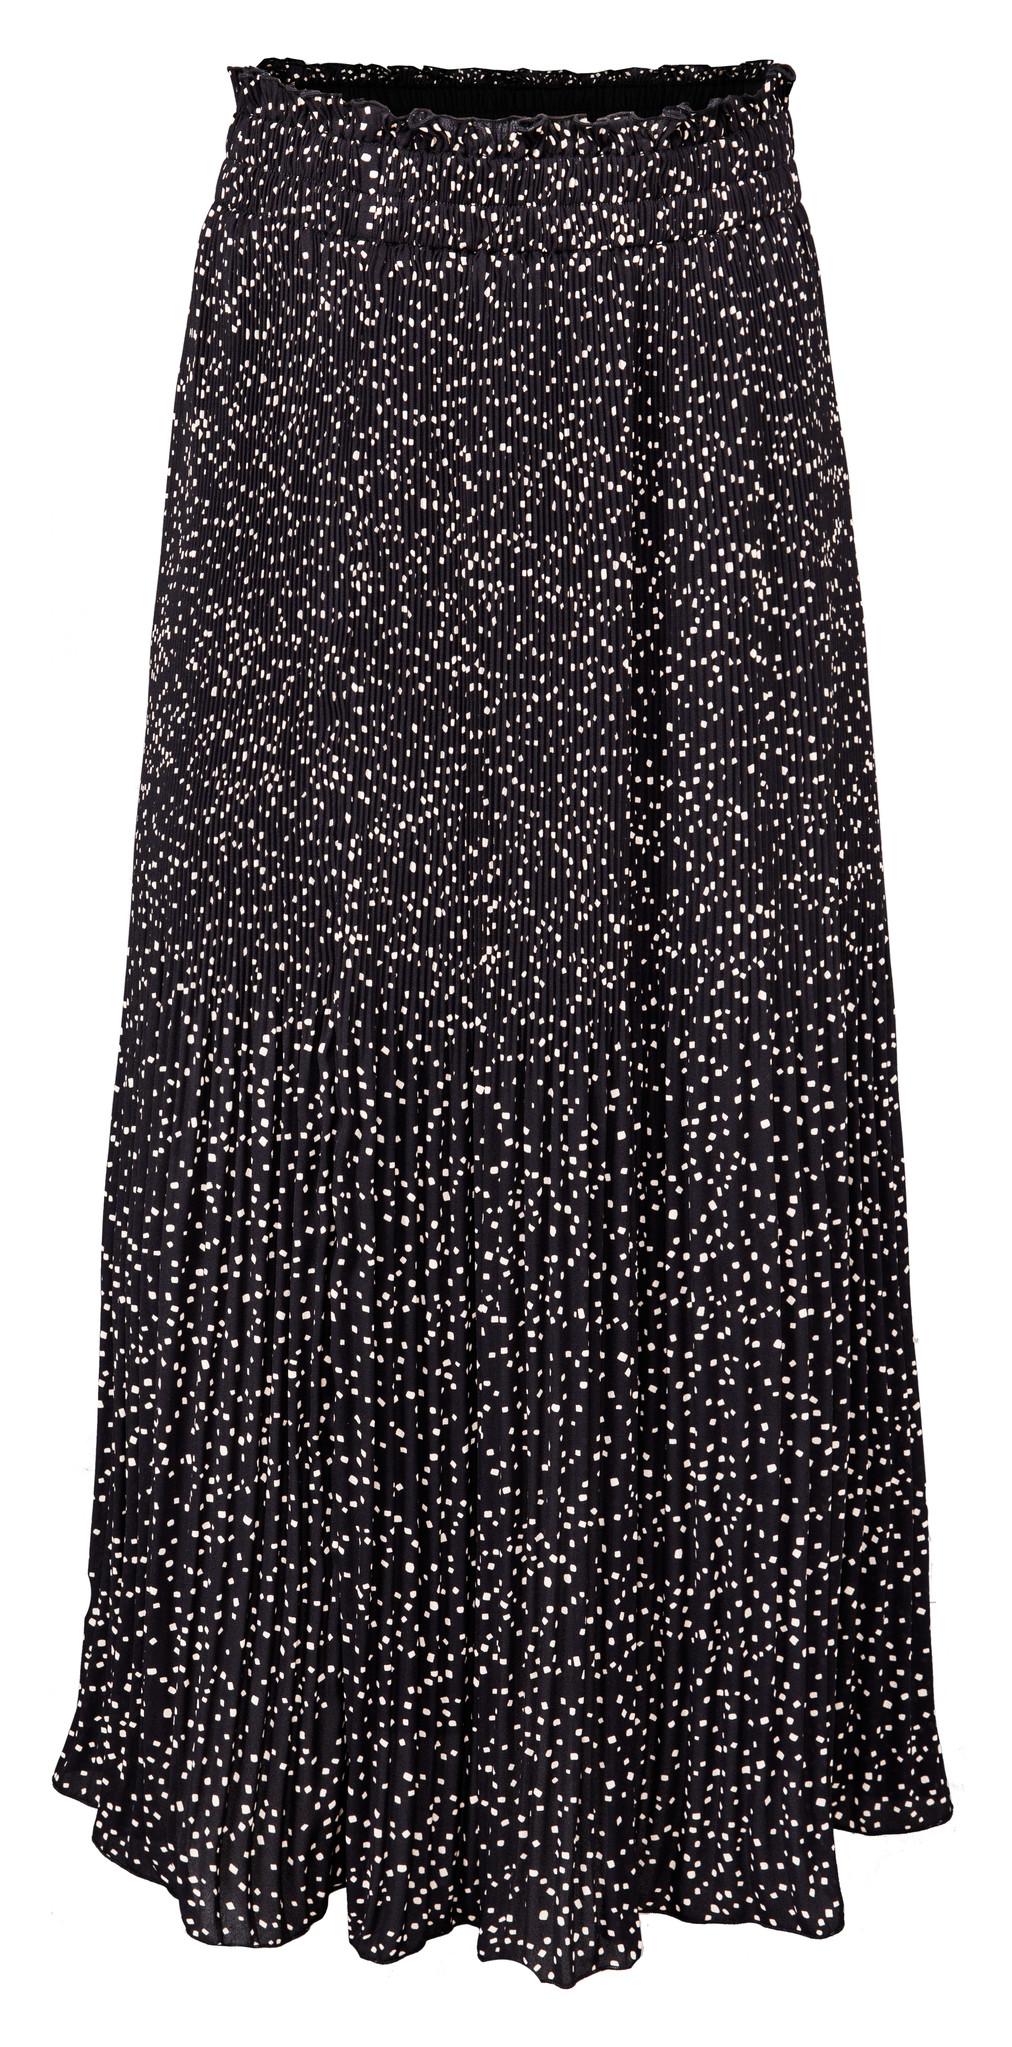 yaya Long plisse skirt 1401166-123-1